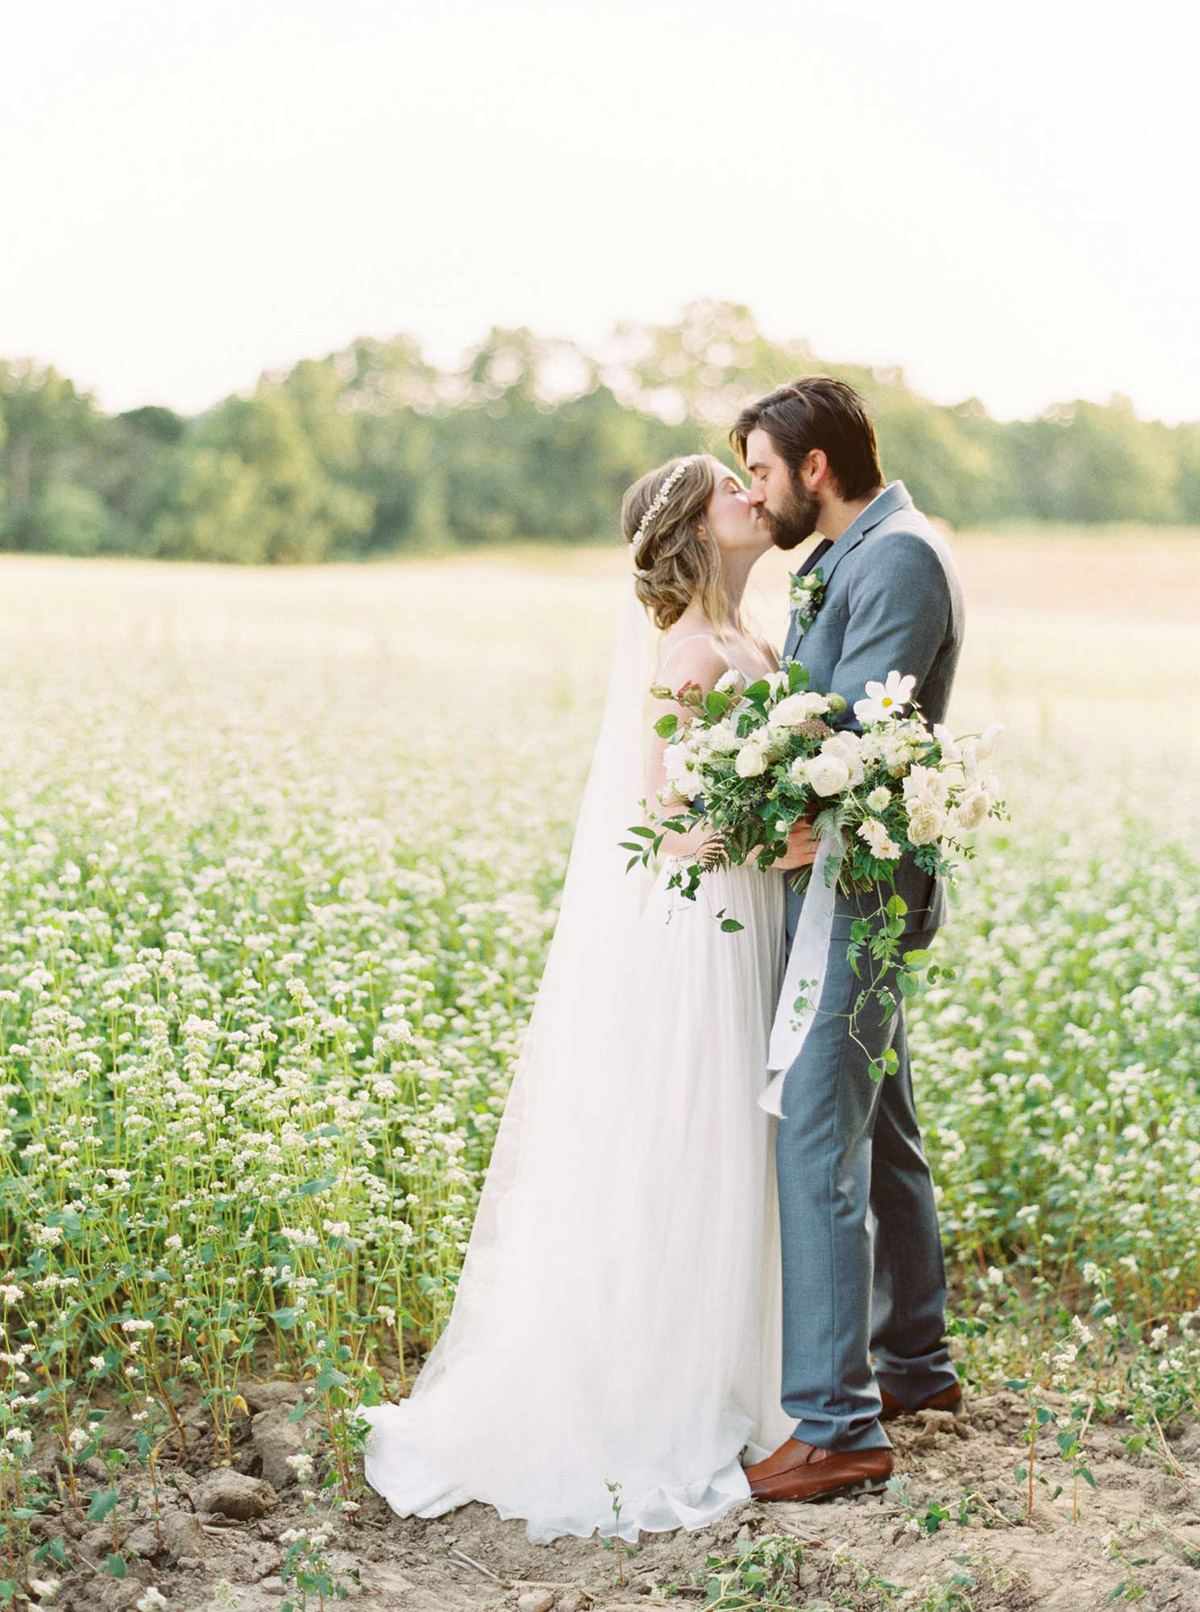 kayla-yestal-vineyard-bride-swish-list-woodland-weddings-niagara-wedding-editorial-31.jpg